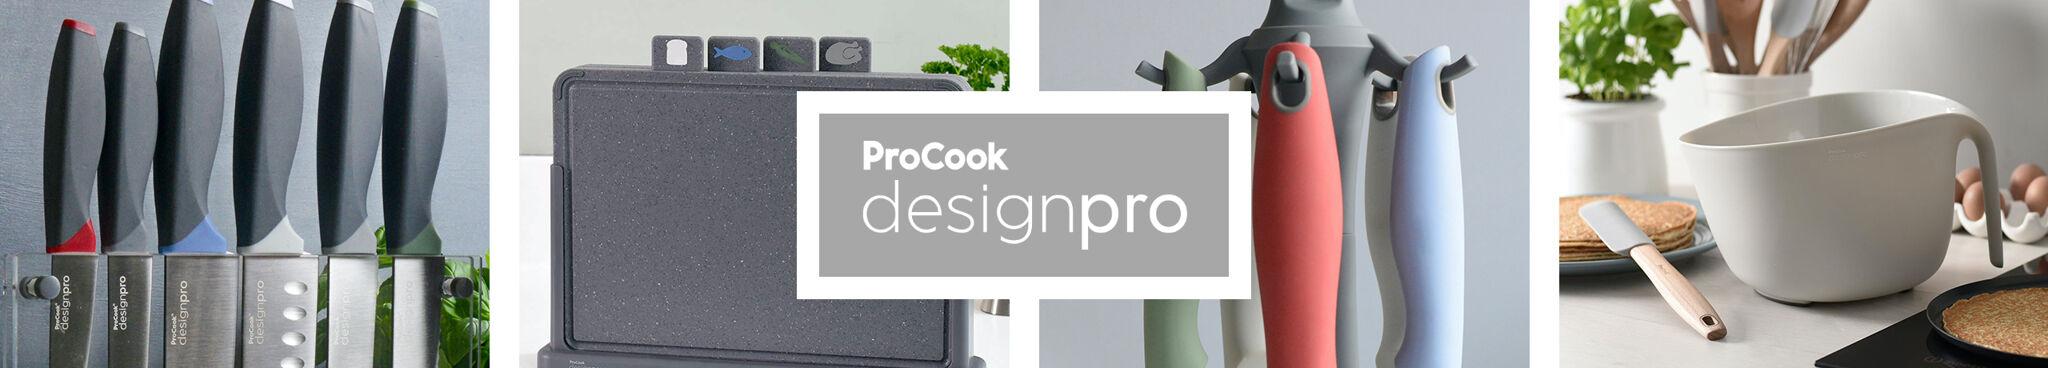 designpro